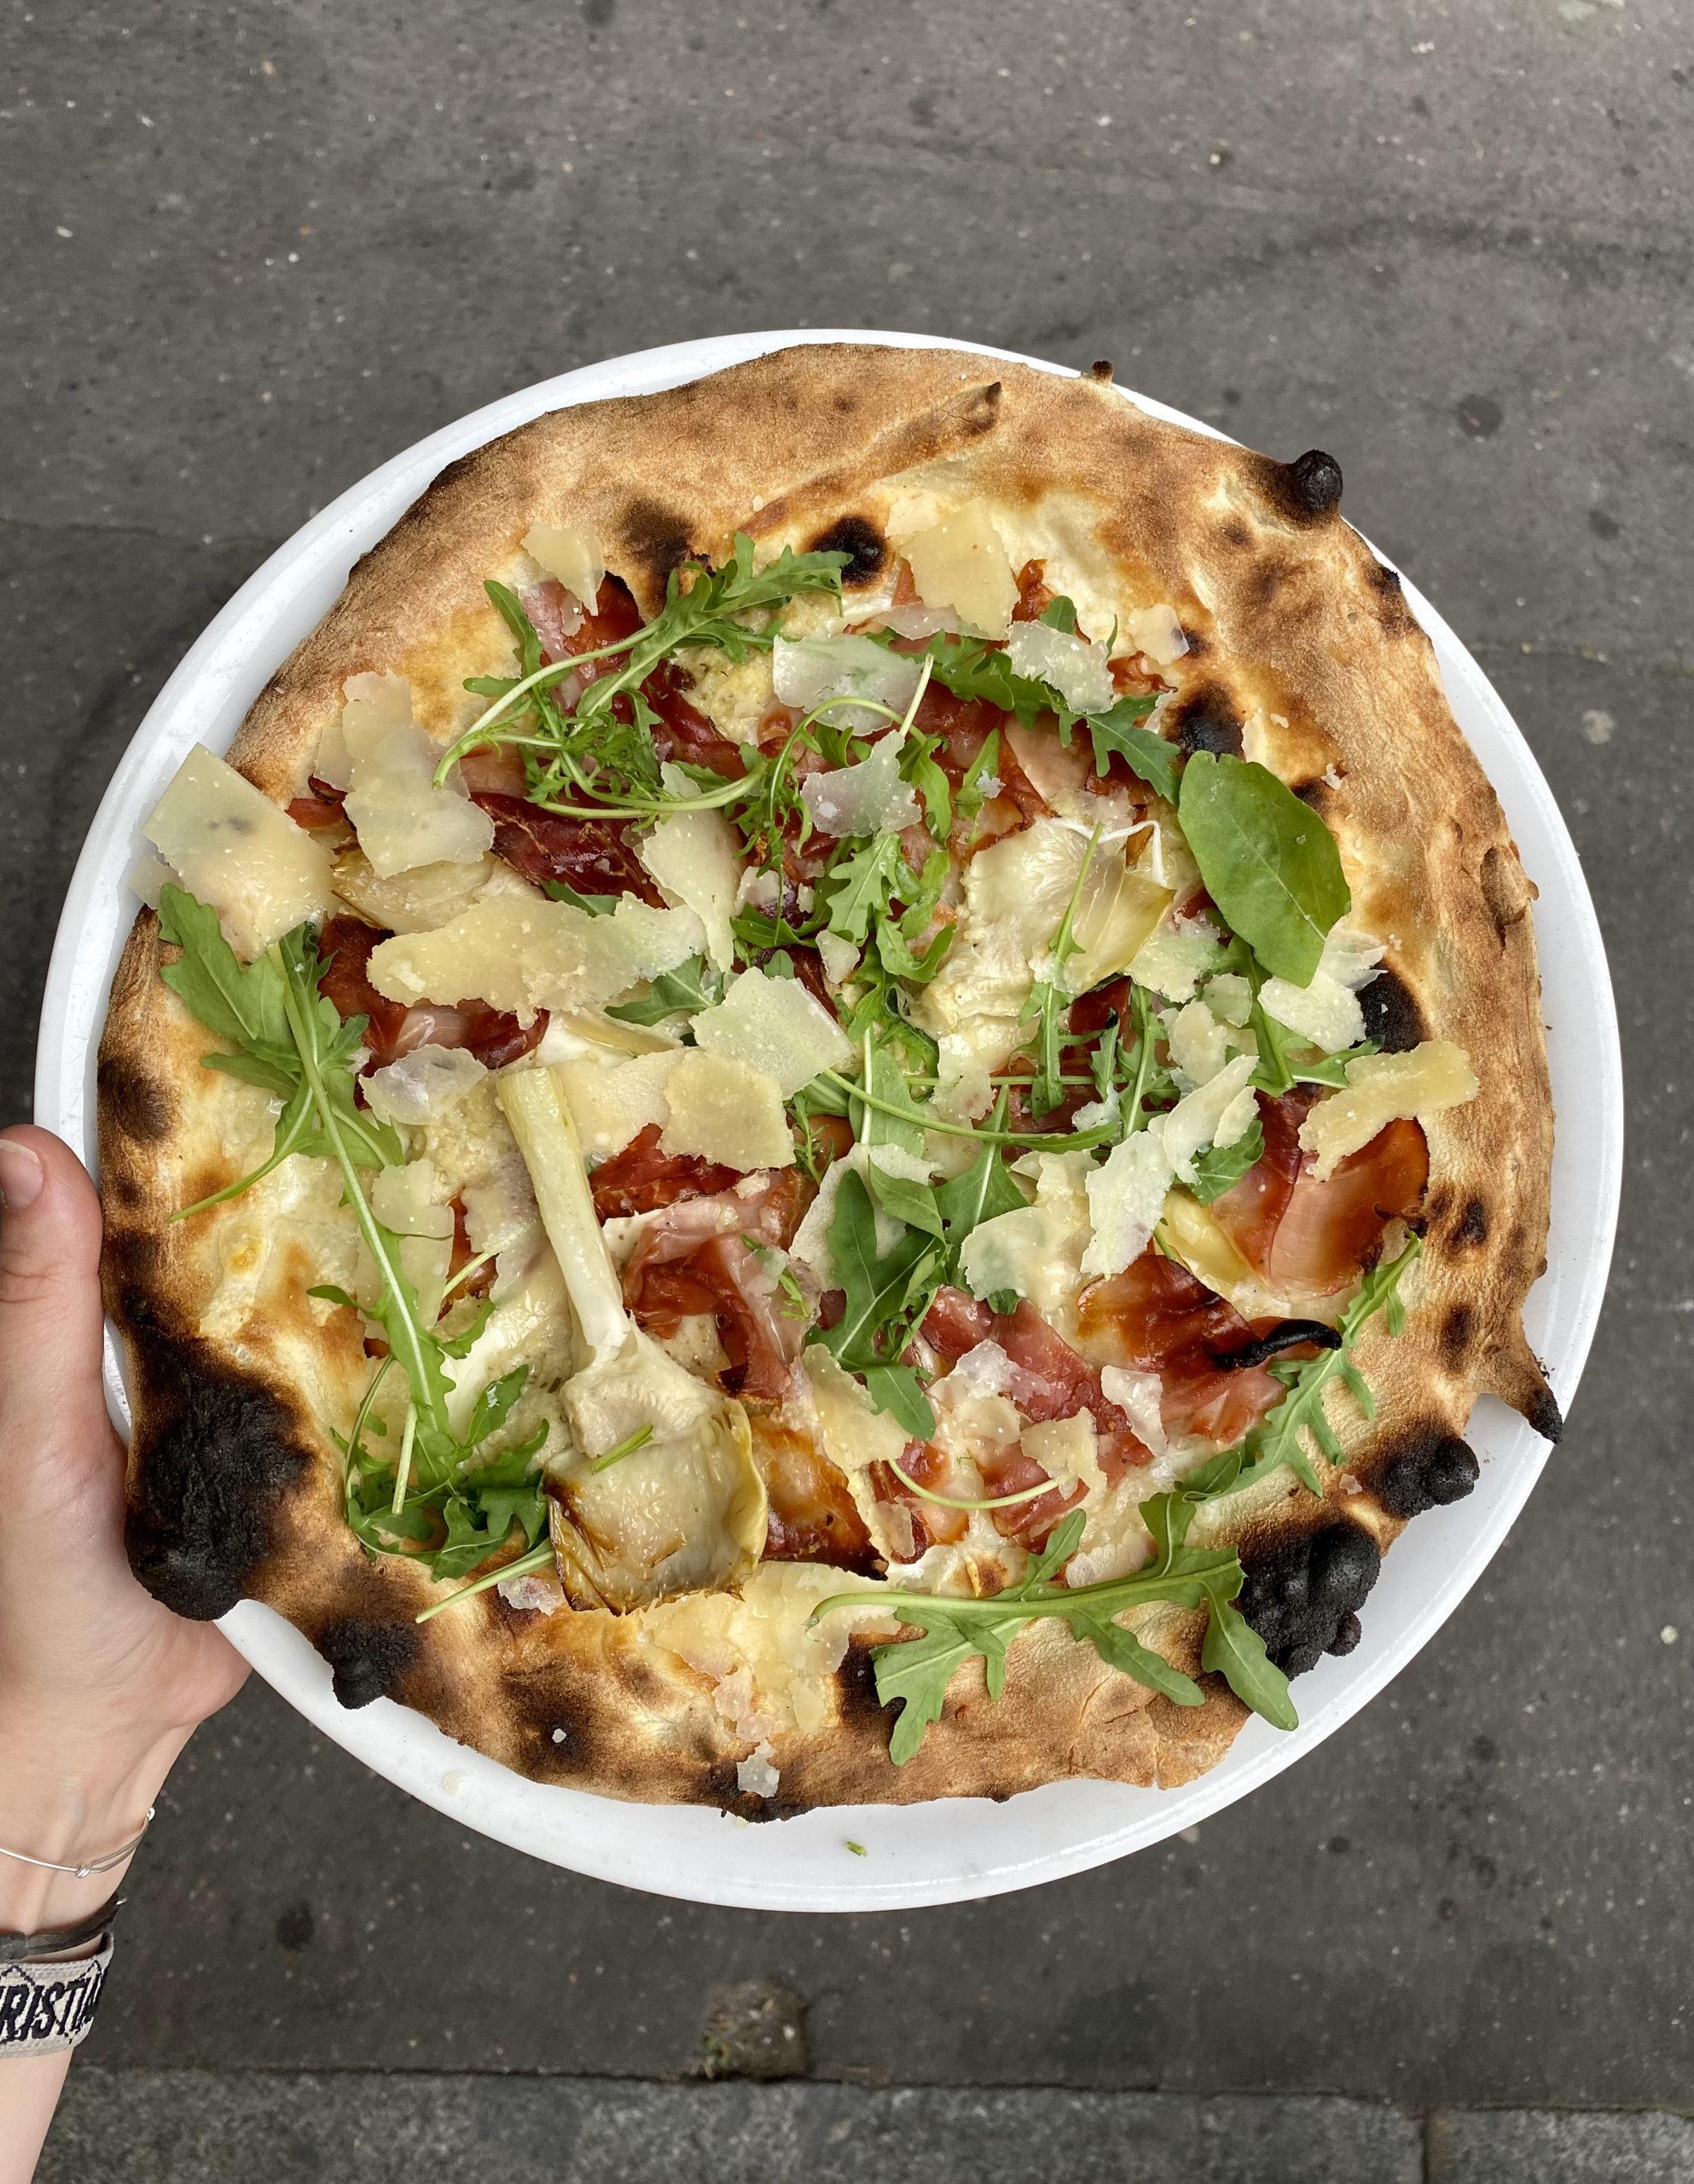 batignolles lesbatignolles paris paris17 blog food yummy pizza pizzeria italianfood cucuzza burrata restaurantitalien